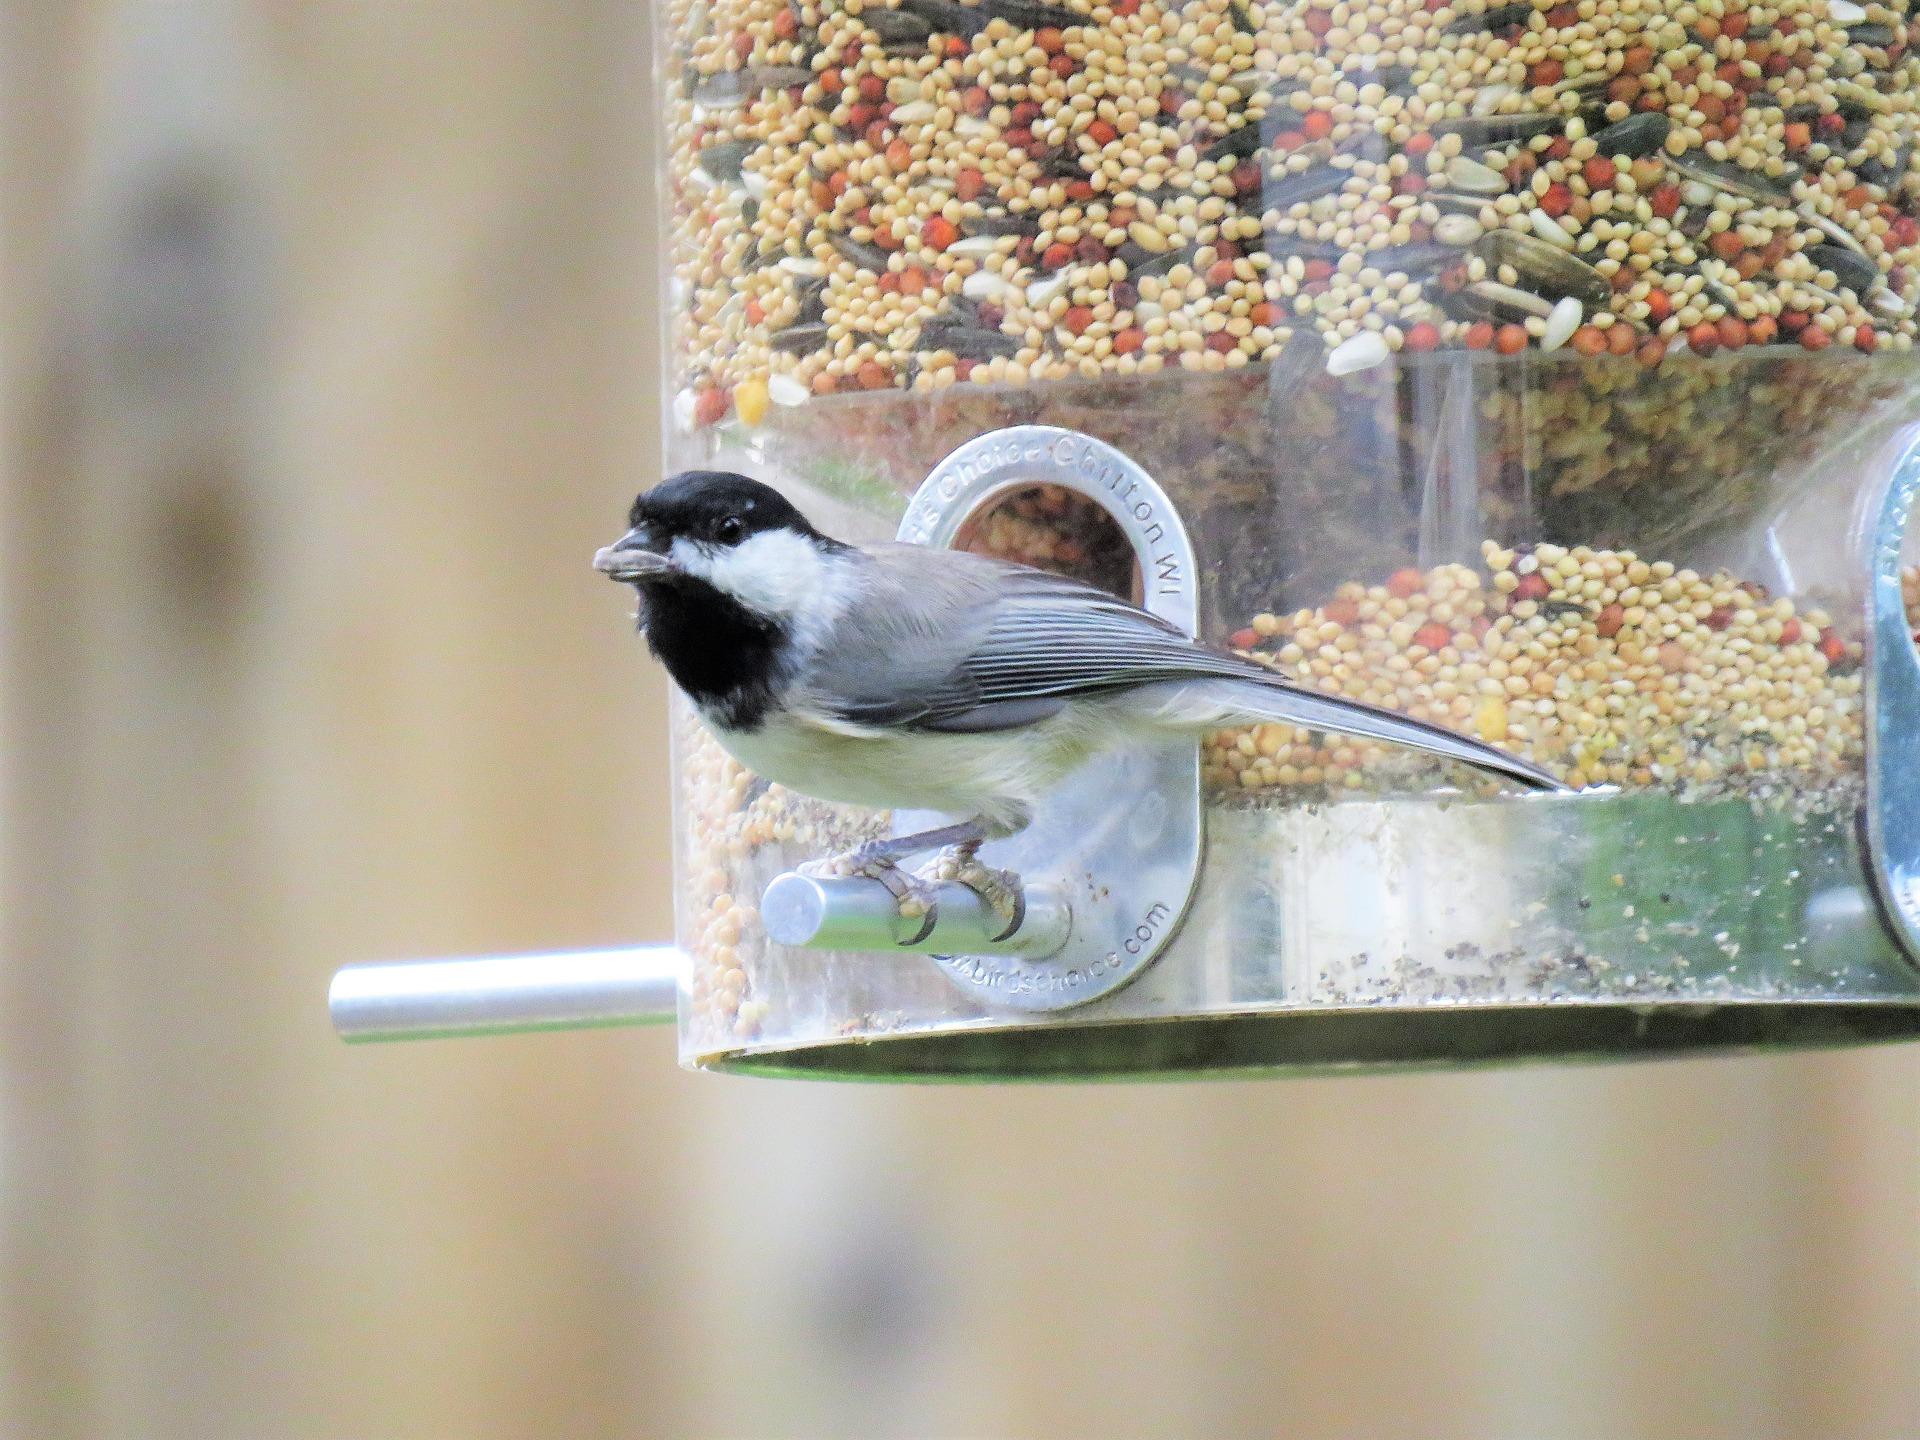 Bird feeder placement can influence safety of backyard birds.